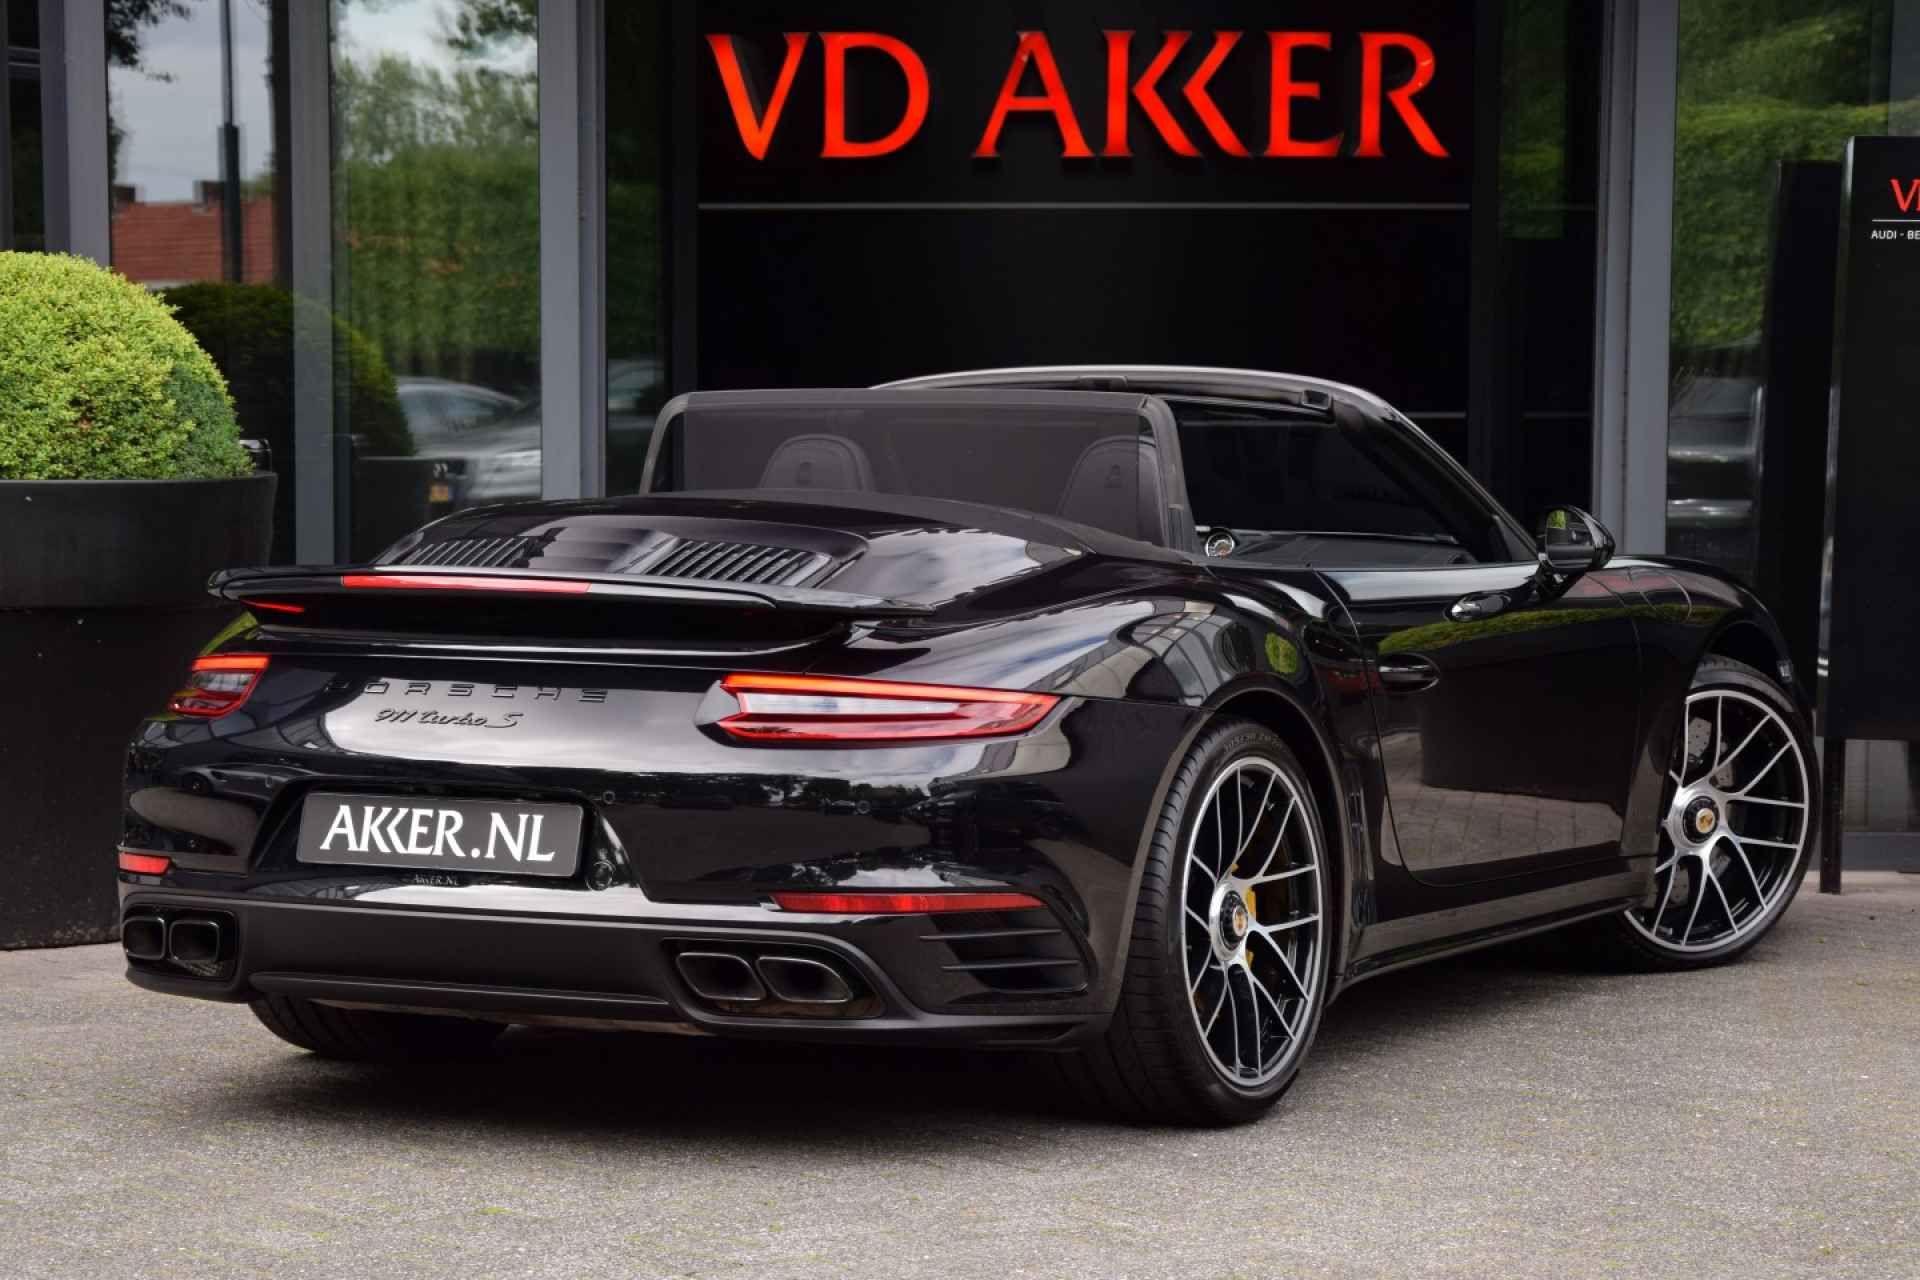 Porsche 991 Turbo S Cabriolet Occasion Vd Akker